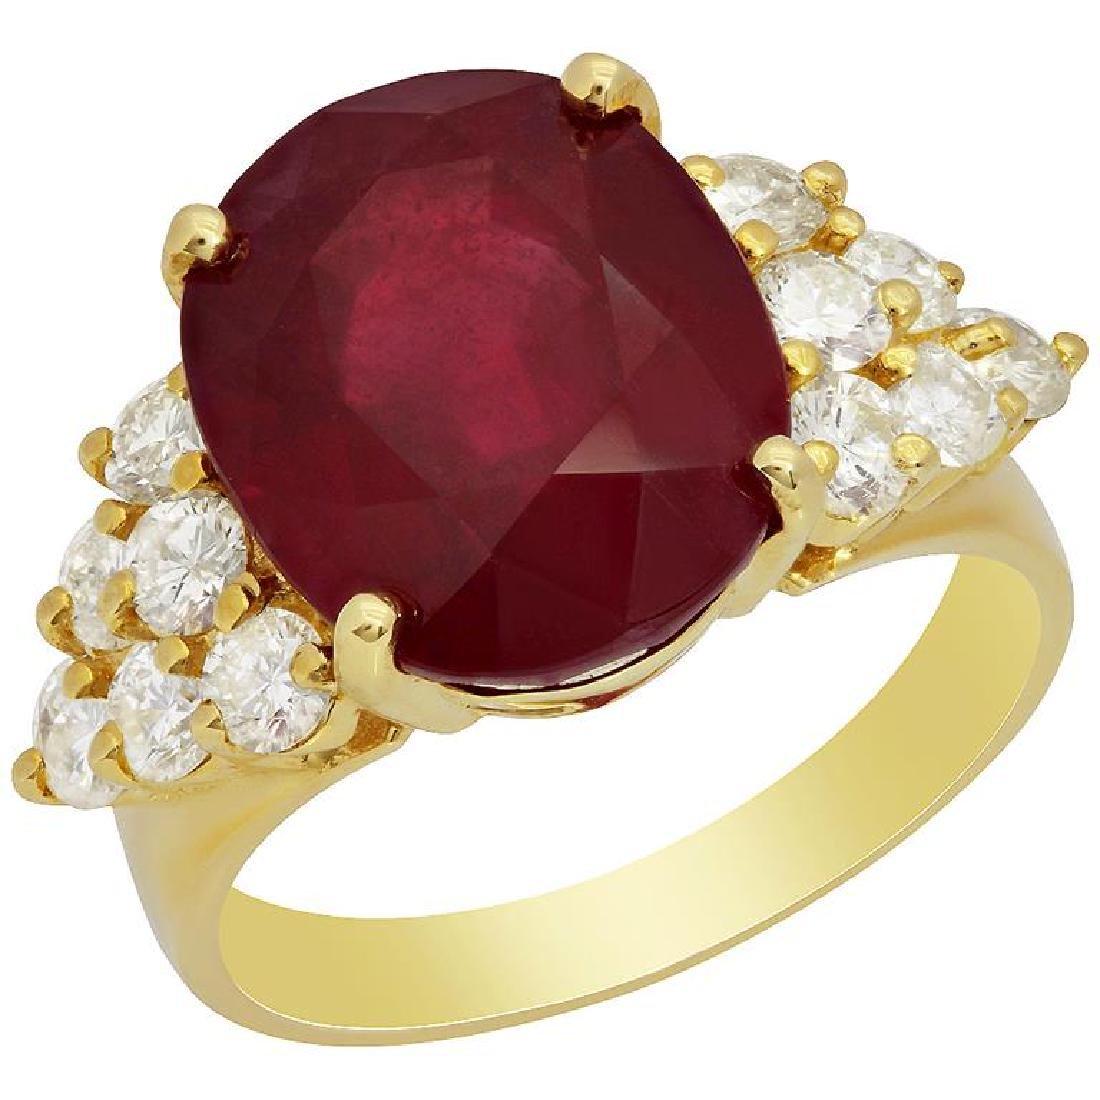 14k Yellow Gold 10.56ct Ruby 1.06ct Diamond Ring